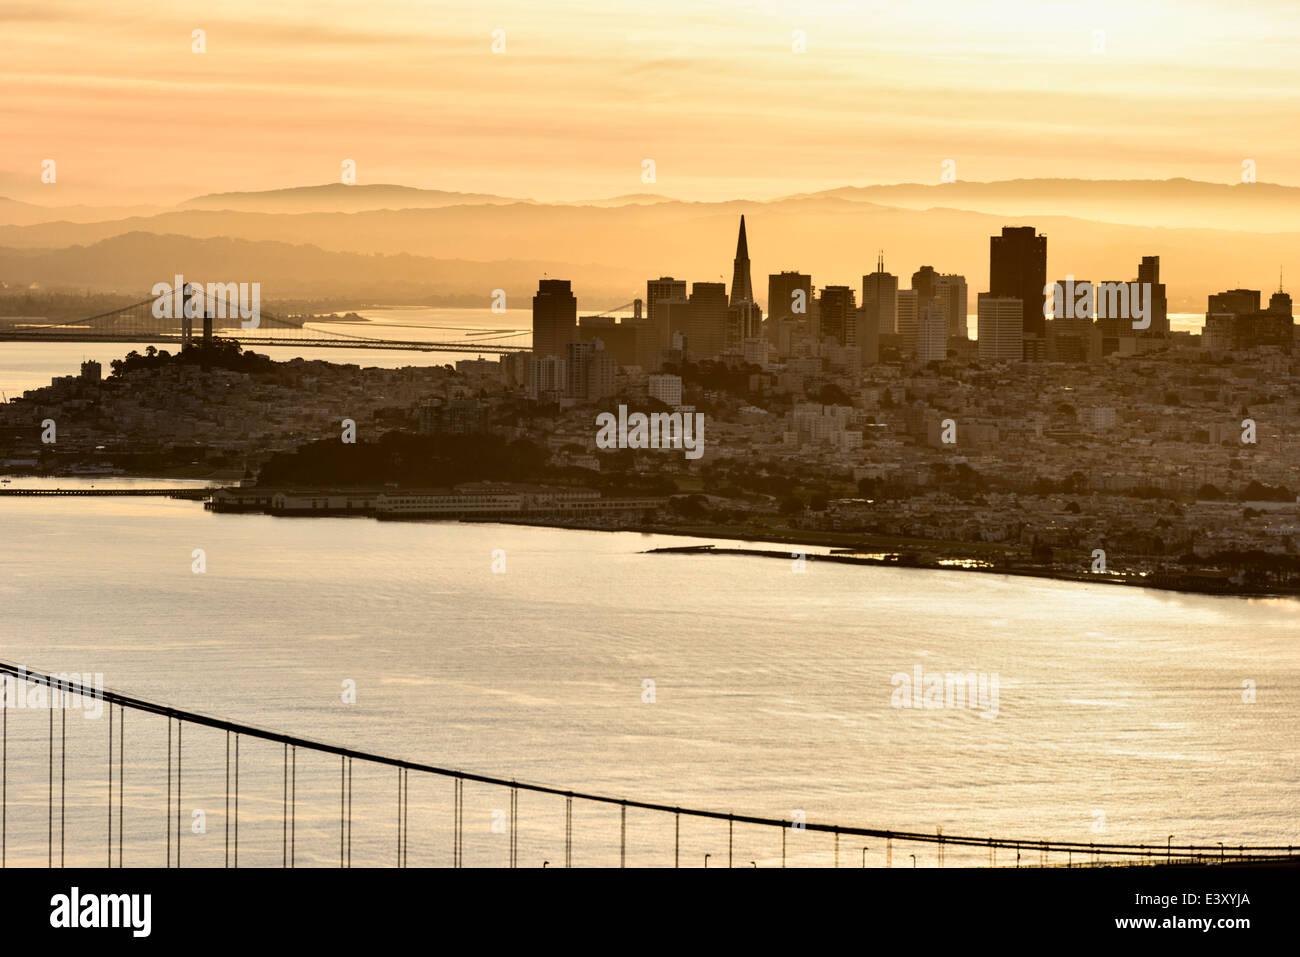 Silhouette de San Francisco city skyline at sunset, San Francisco, California, United States Photo Stock